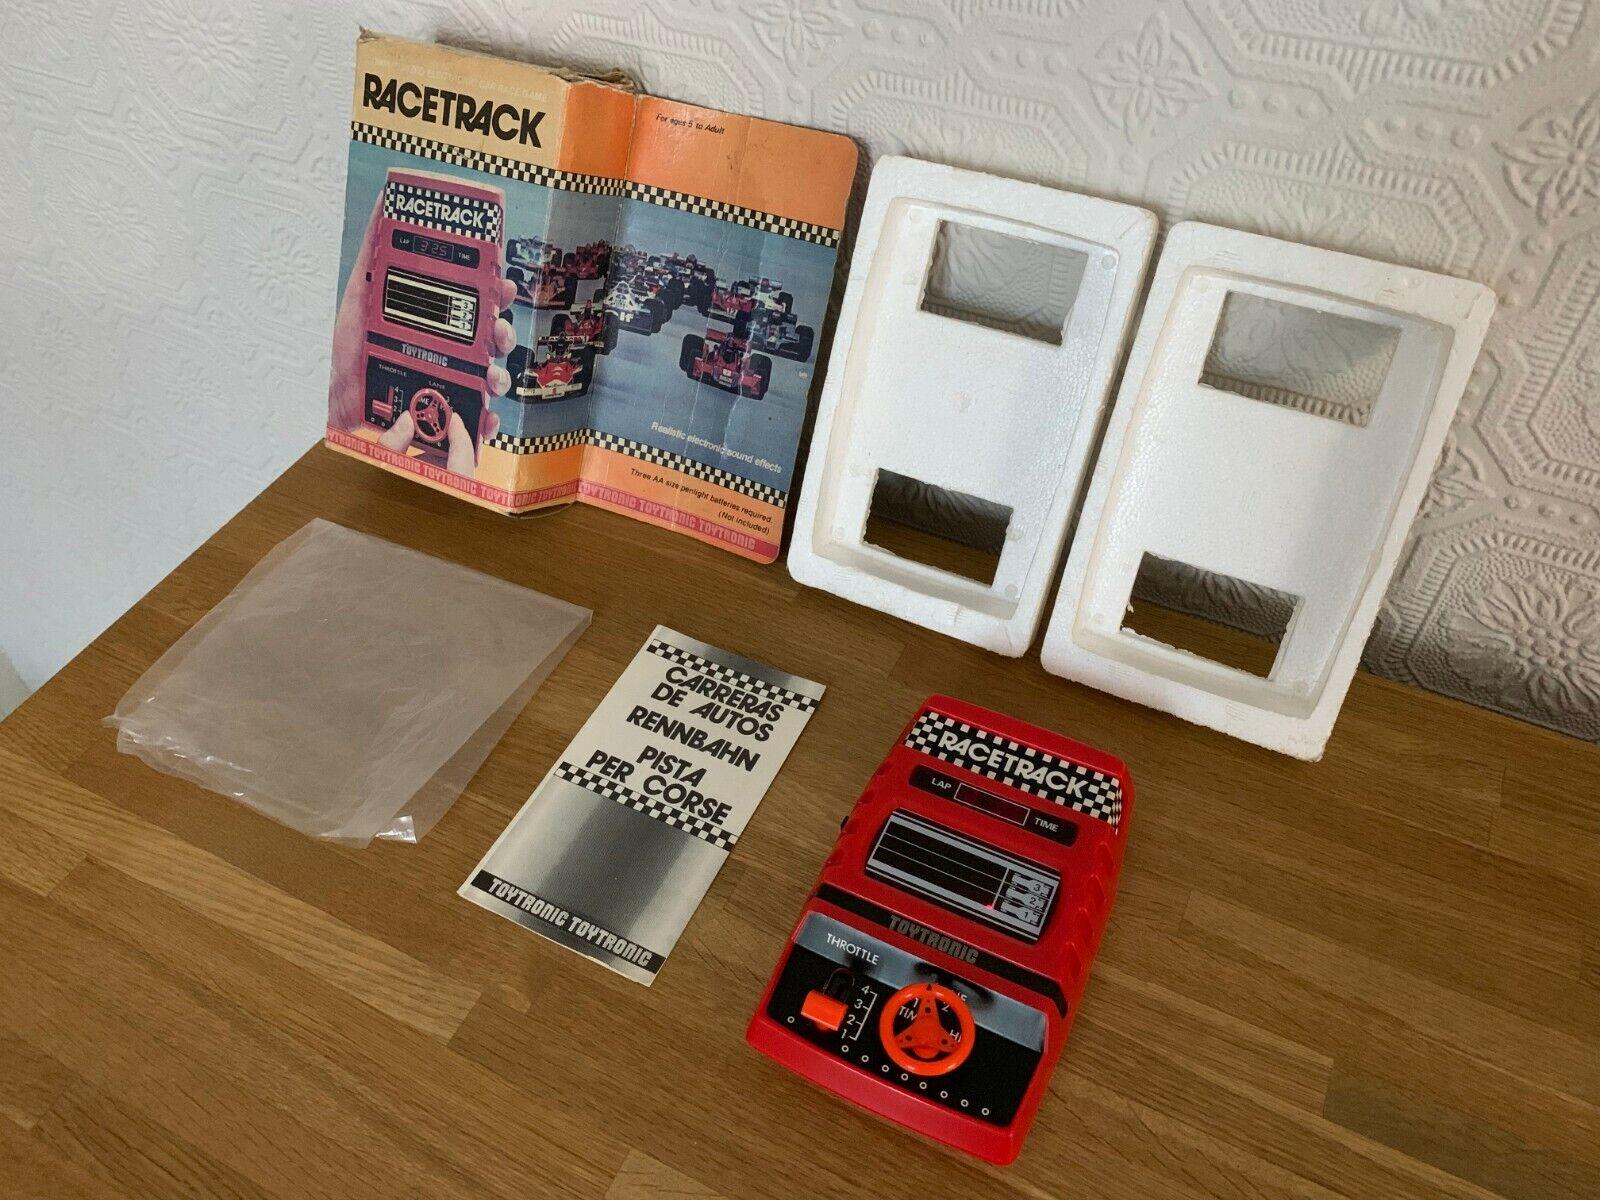 Ultra Raro en Caja Juguetetronic hipódromo Vintage 1980 LED juego electrónico-Nr Menta.